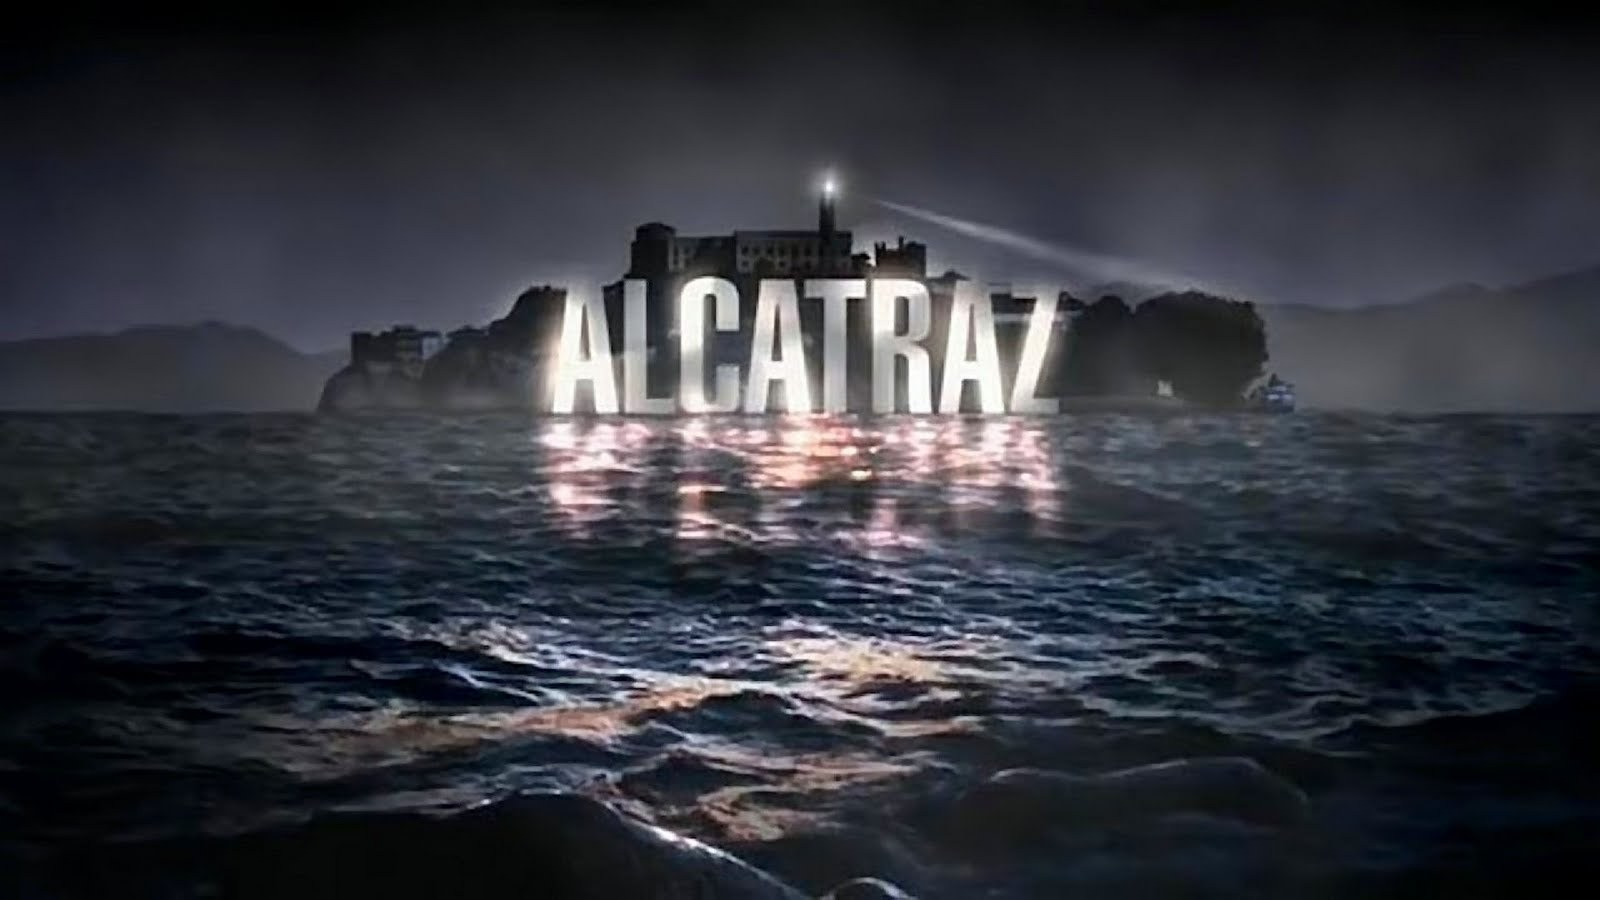 Alcatraz-Wallpapers-alcatraz-tv-show-22286230-1600-900.jpg